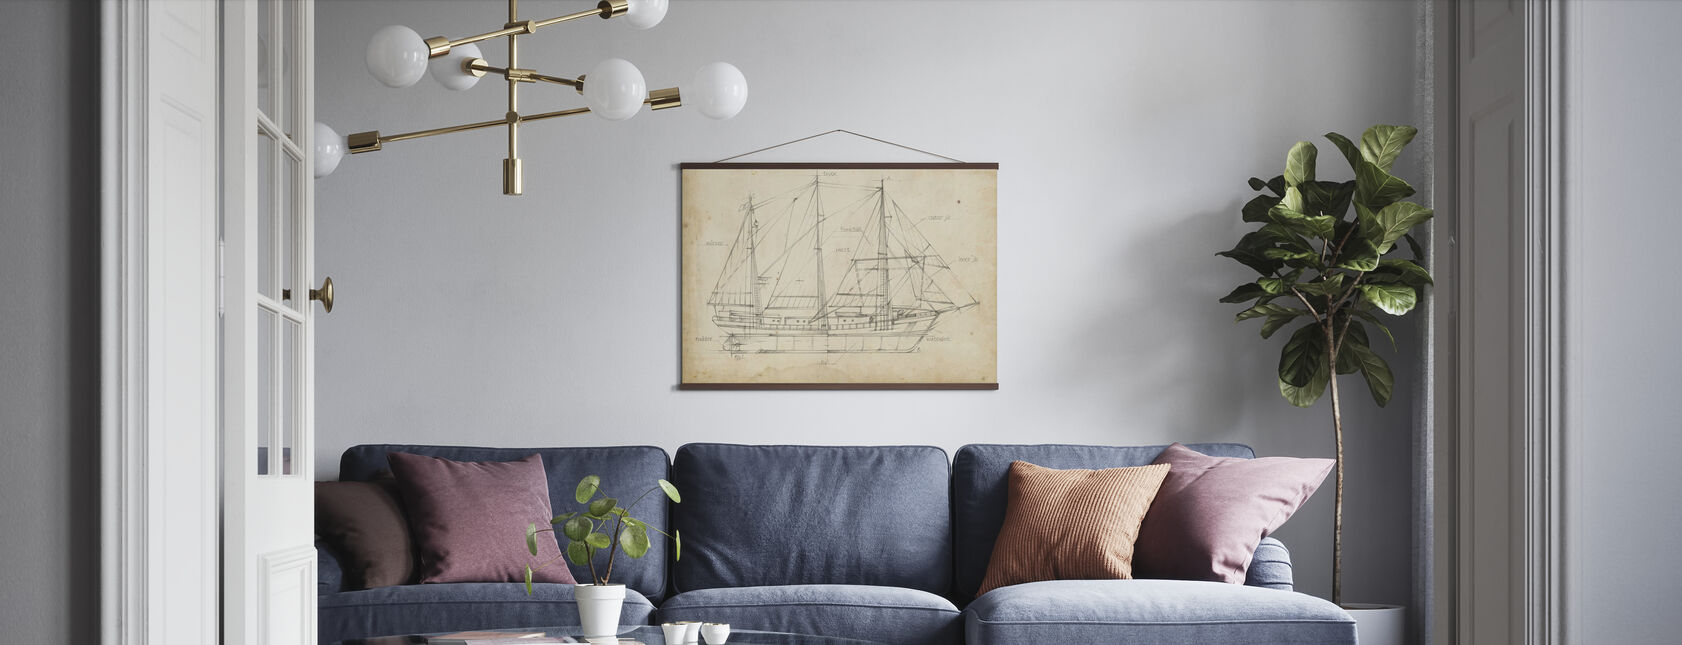 Sailboat Blueprint - Poster - Living Room